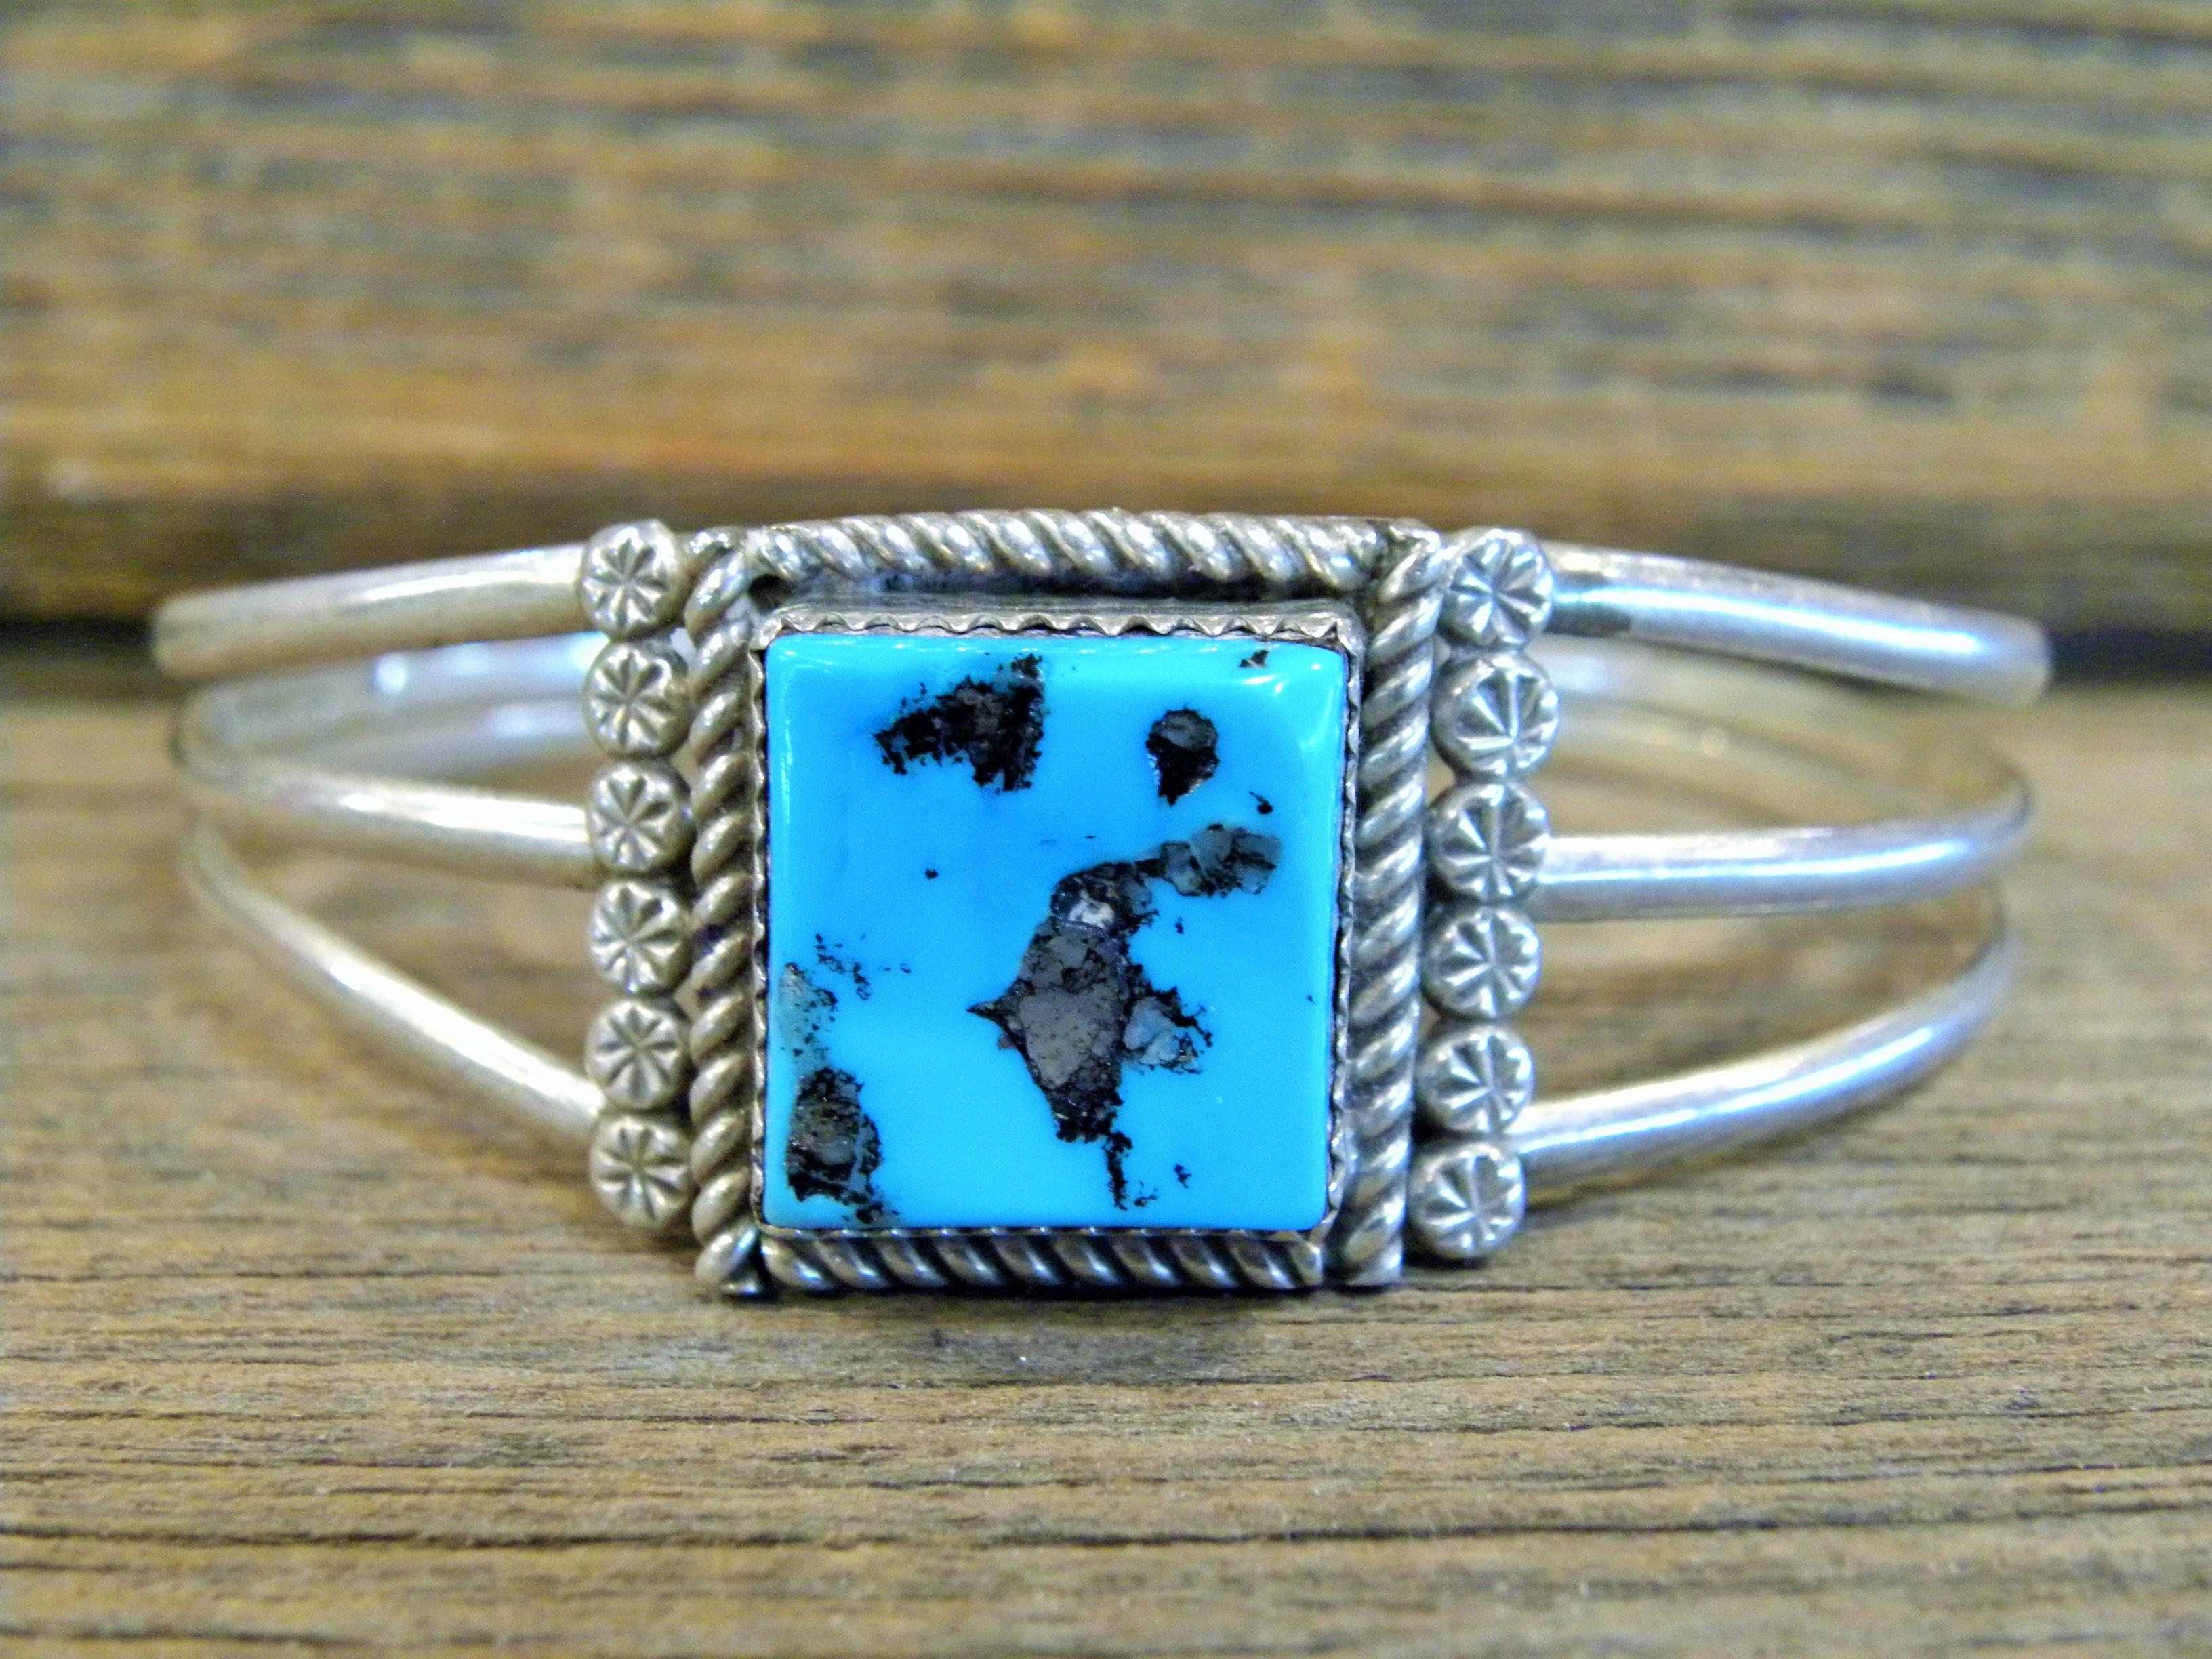 PB24 Pawn Navajo Handmade Sleeping Beauty Turquoise Bracelet